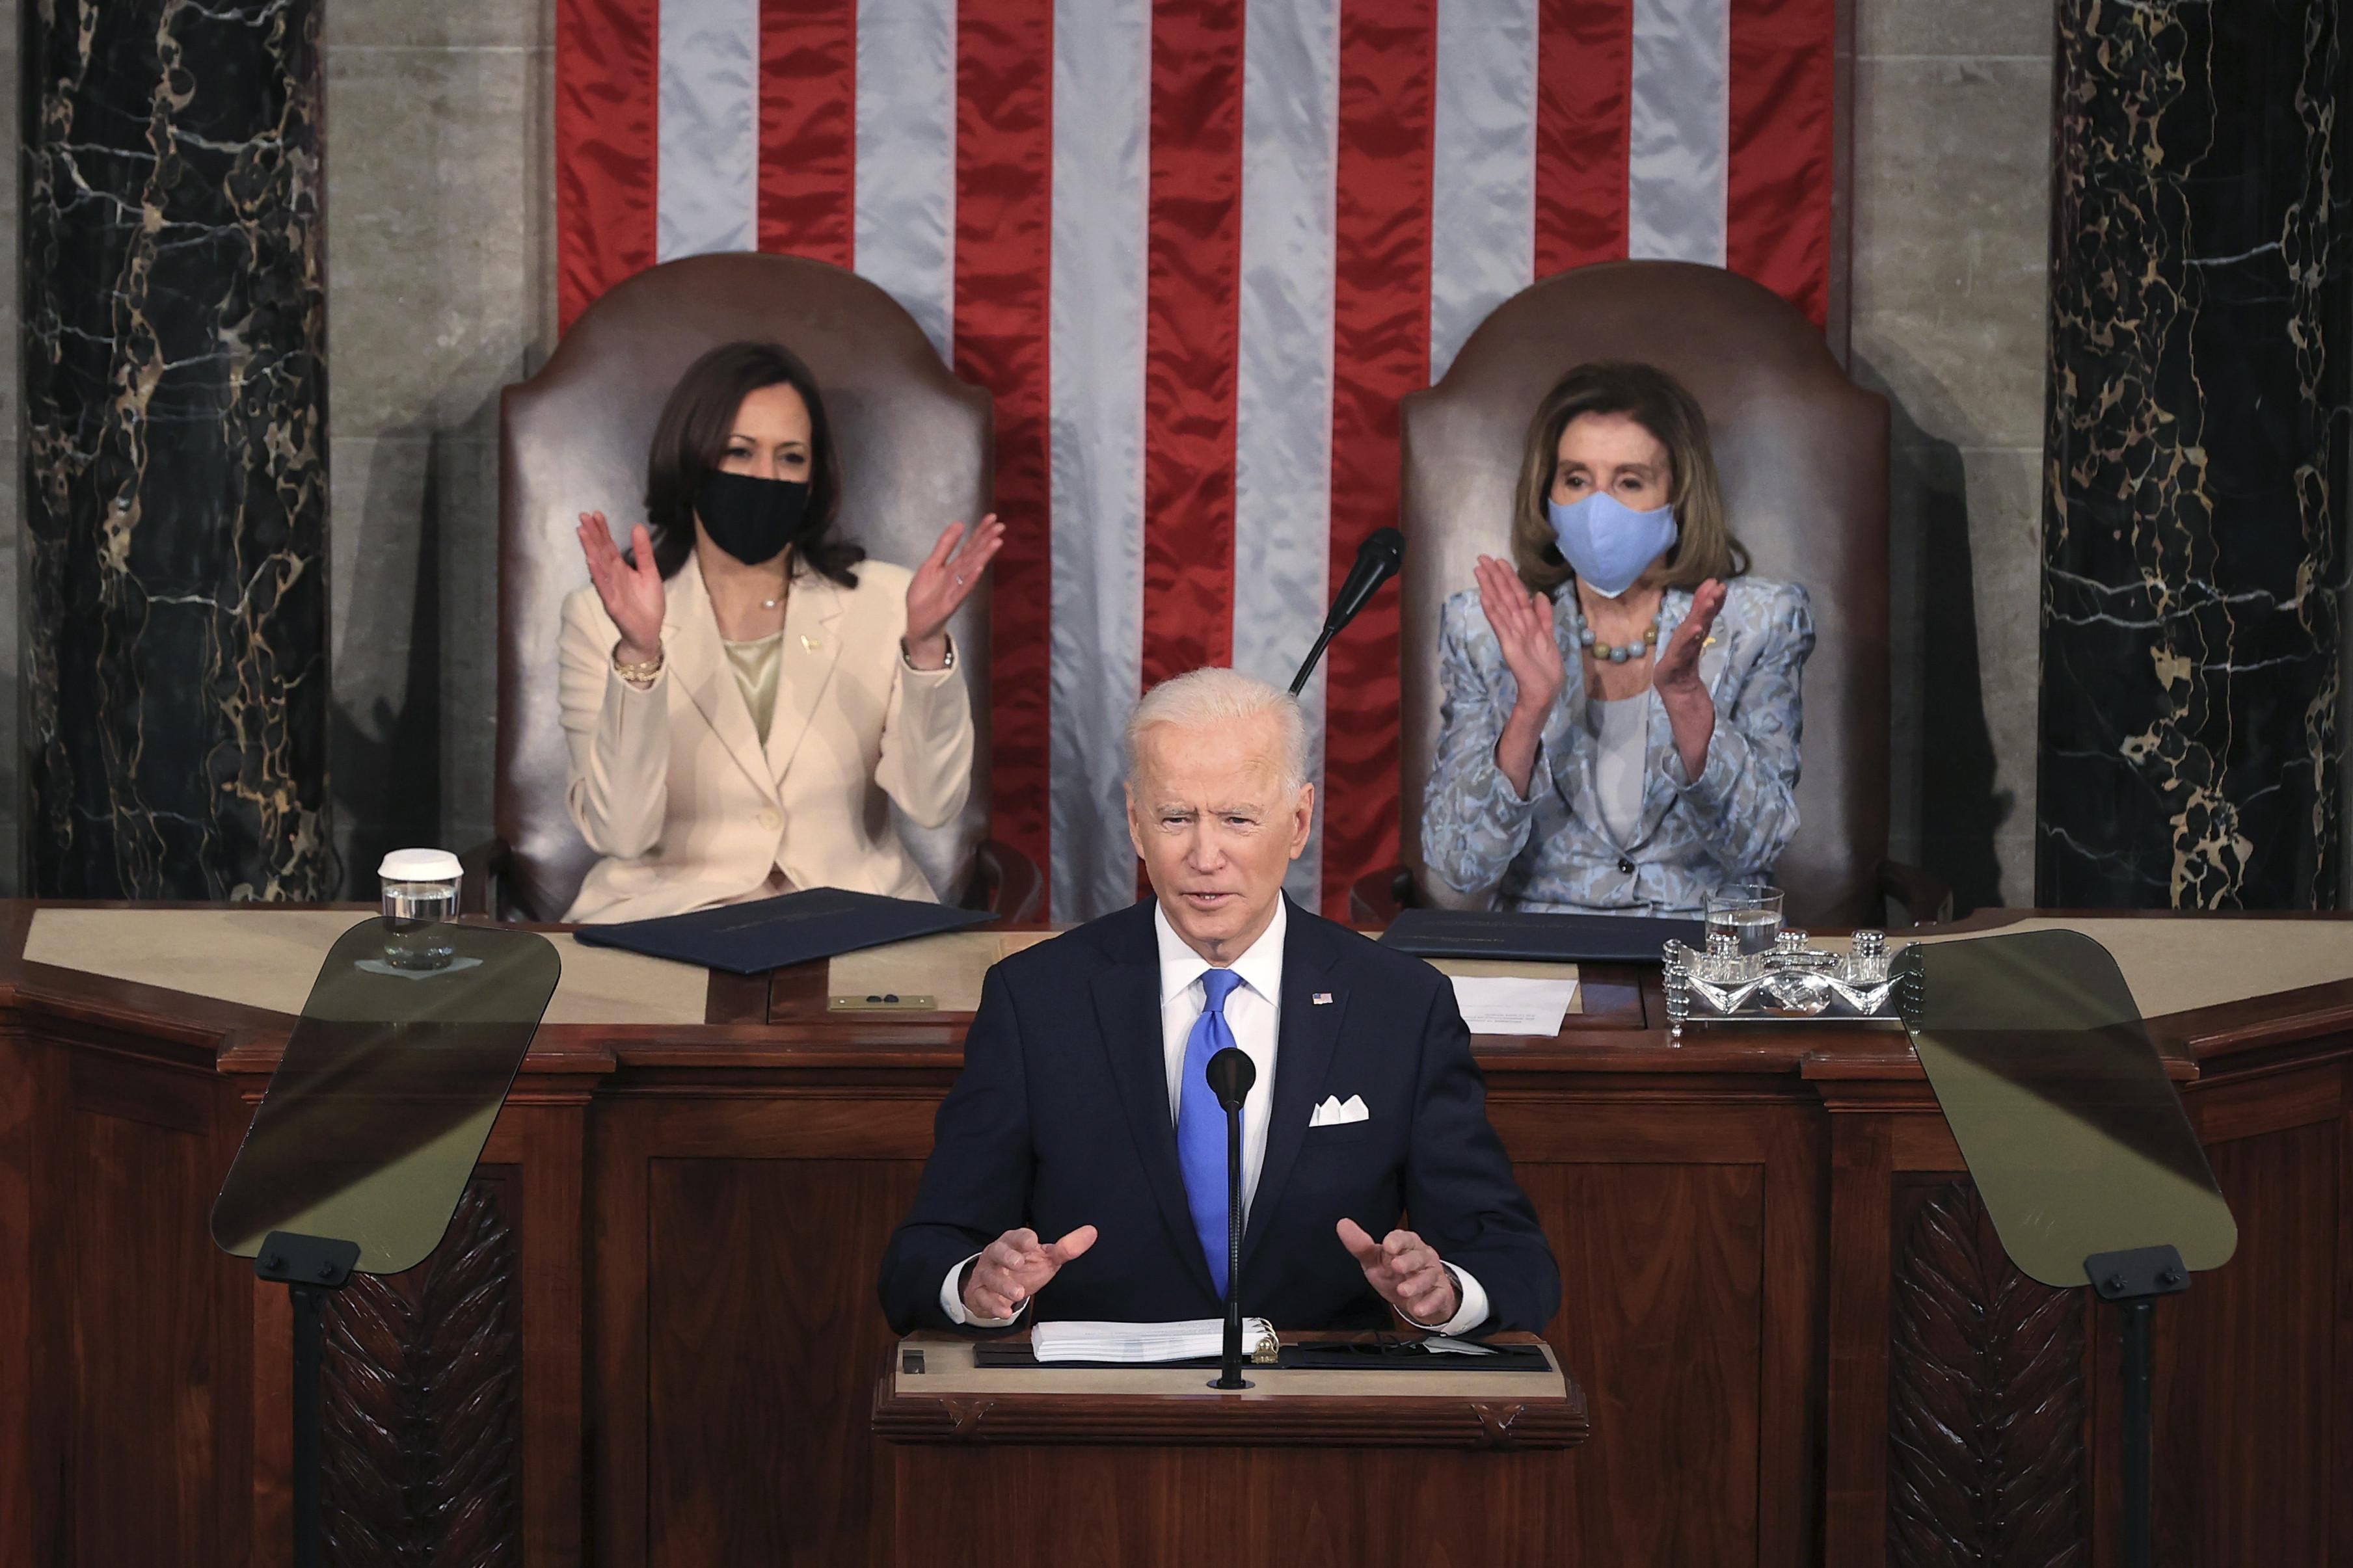 Kamala Harris and Nancy Pelosi make history as the first women to lead Senate at US President Joe Biden